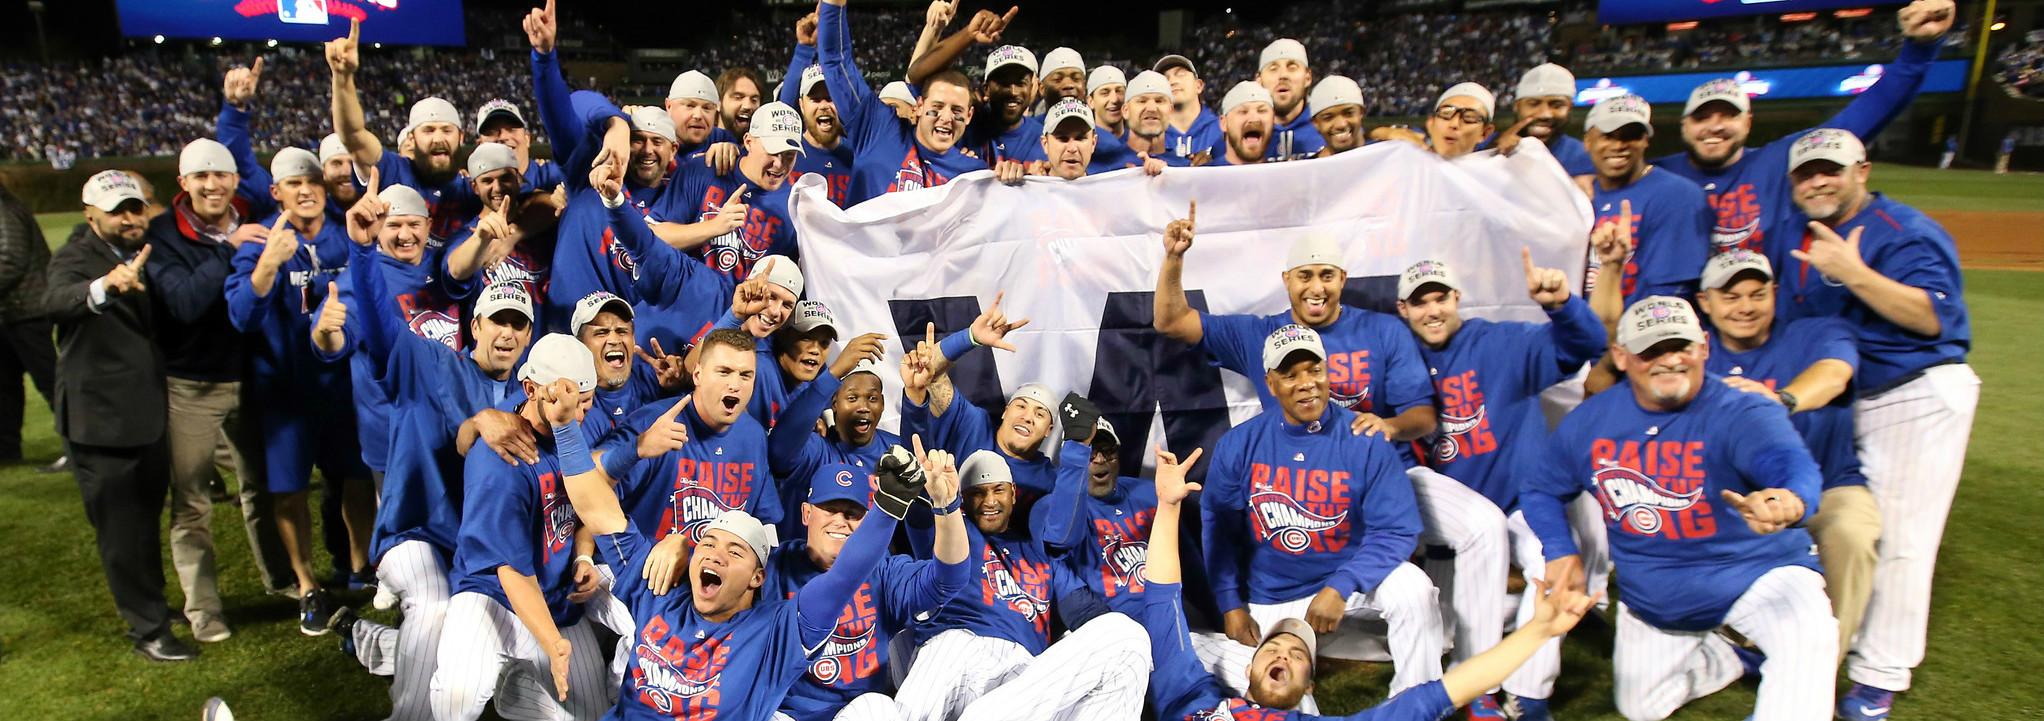 Cubs Win 2016 World Series